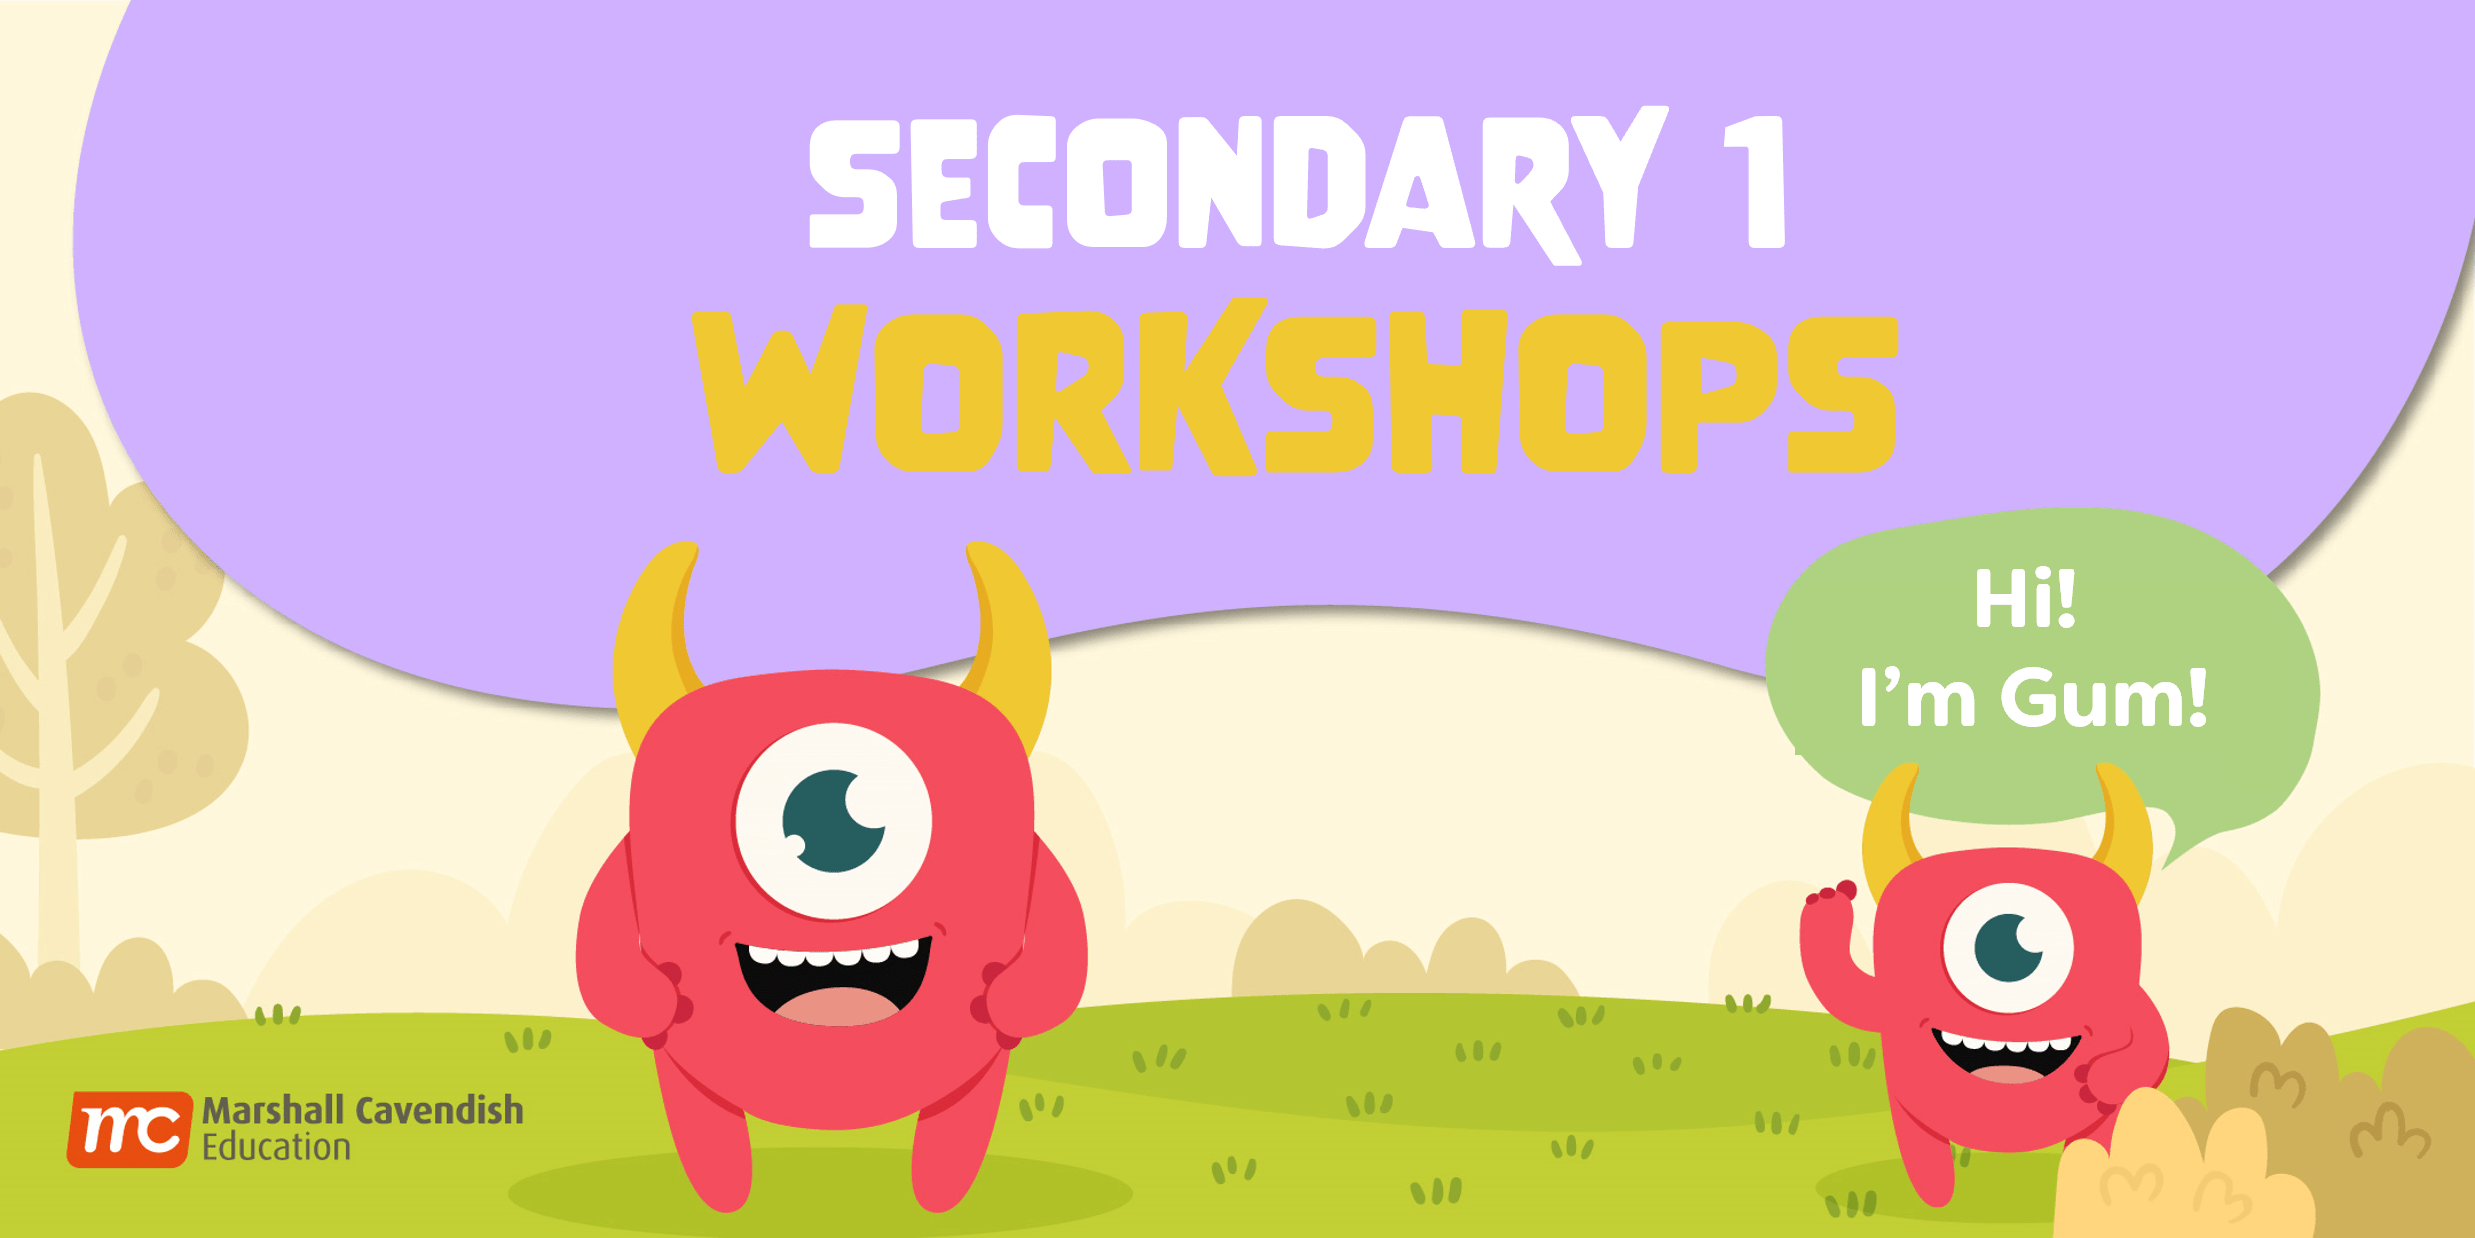 Secondary 1 Workshops